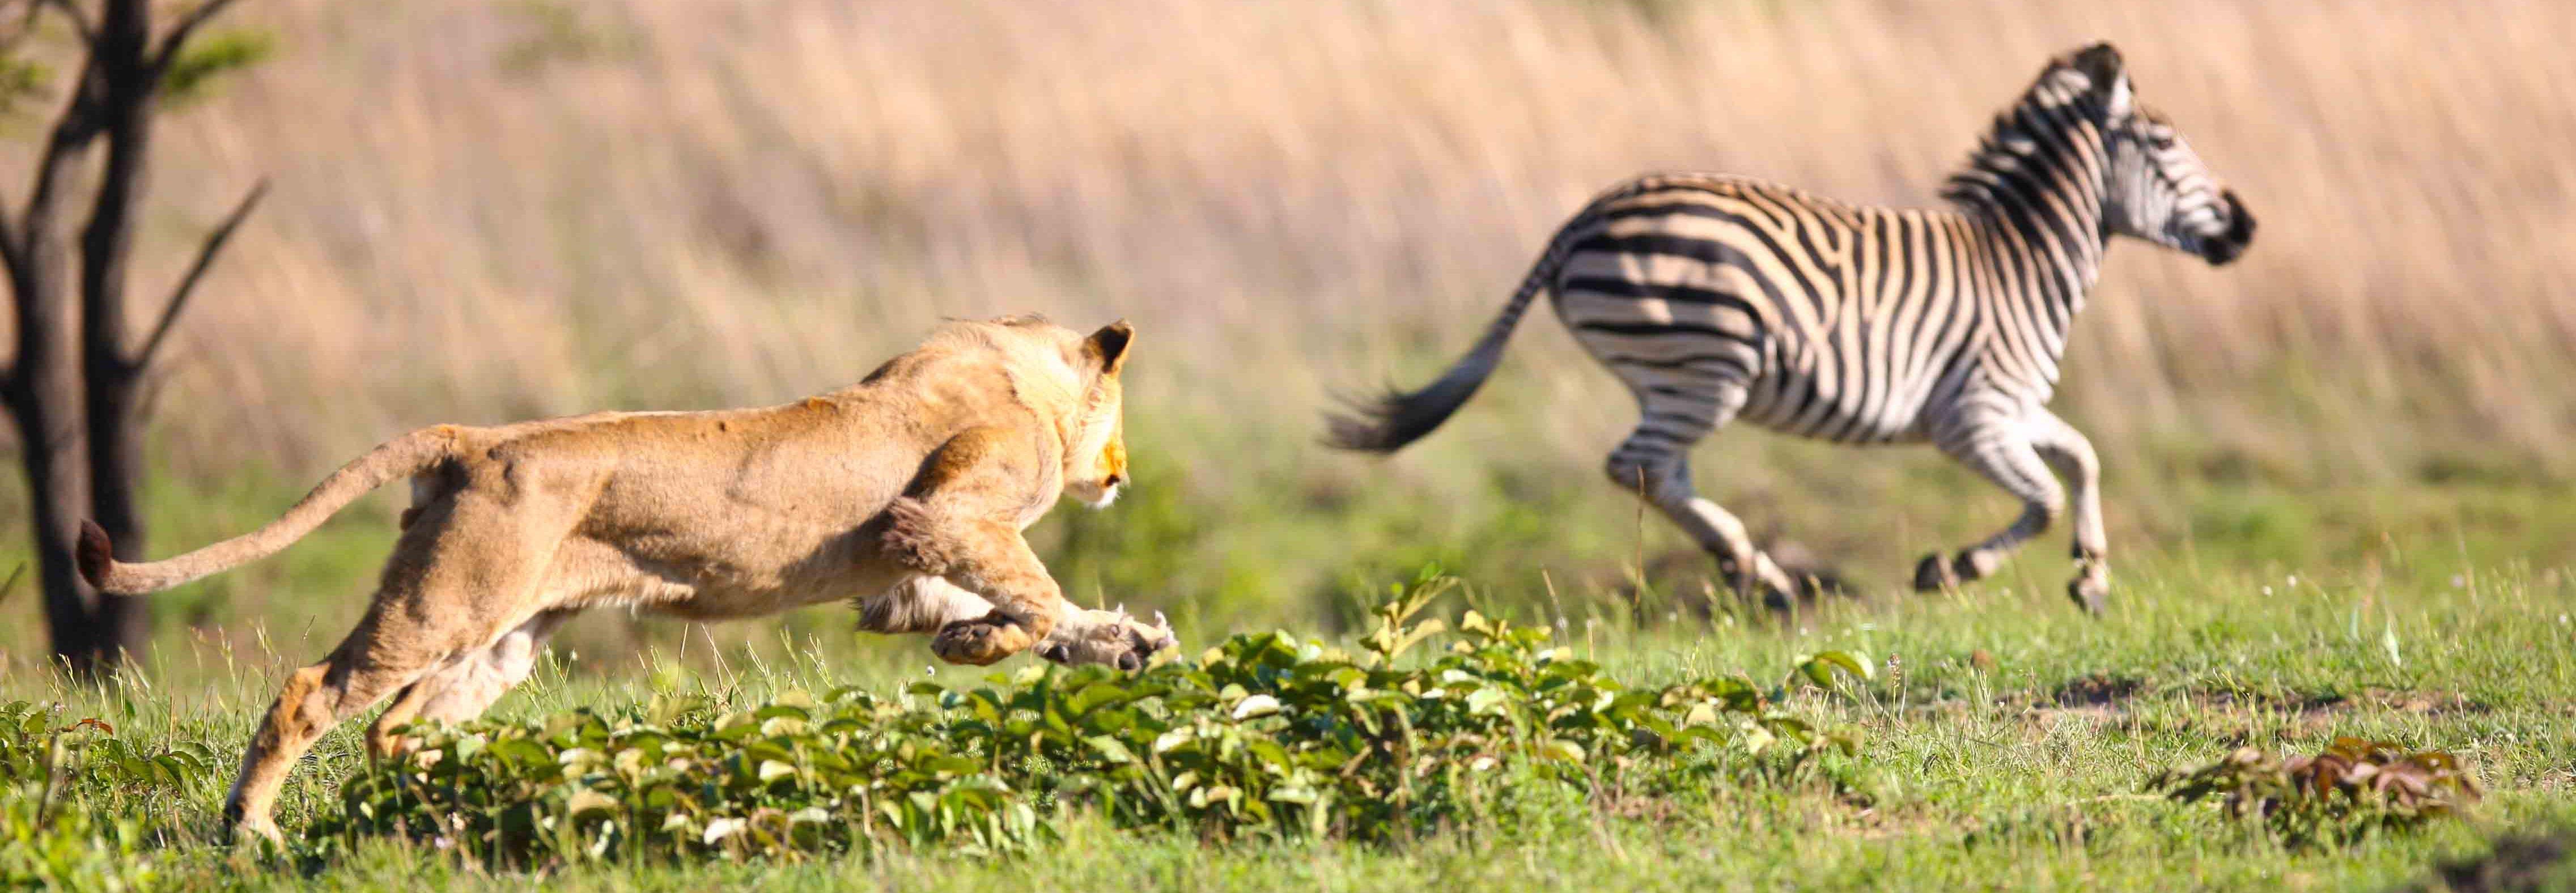 3 Day Tanzania Safari- Tarangire + Lake Manyara + Ngorongoro Crater